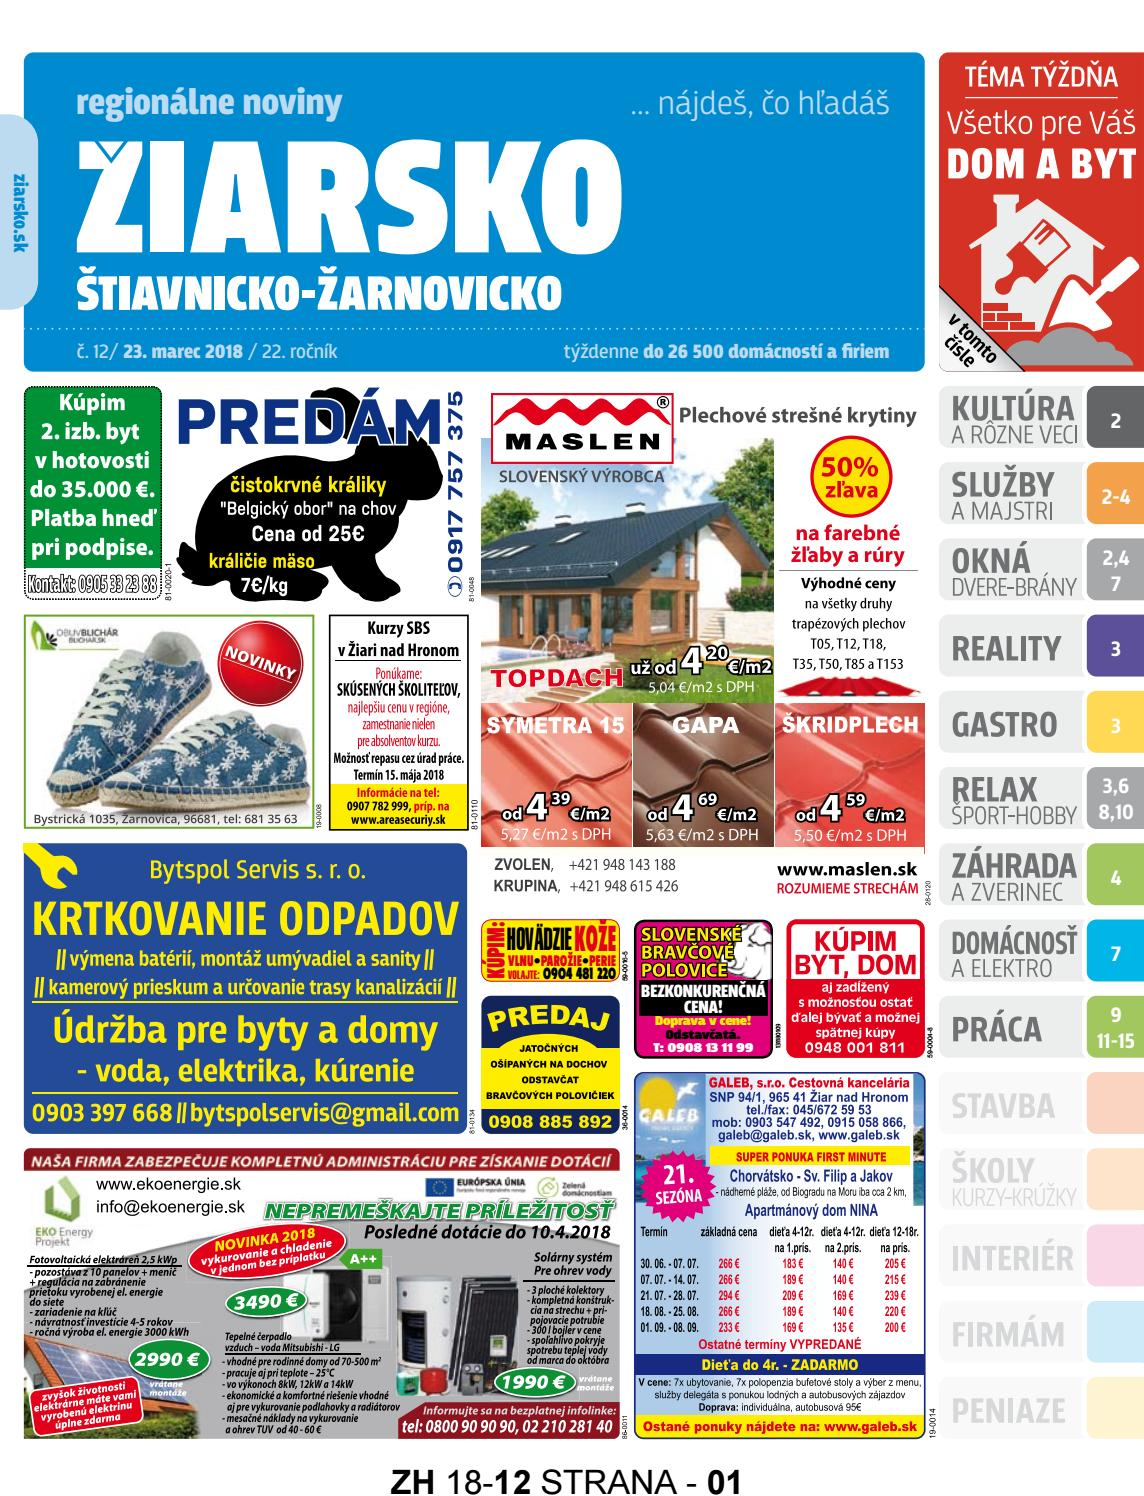 demografia Online Zoznamka Ukrajina Zoznamka Recenzie stránok